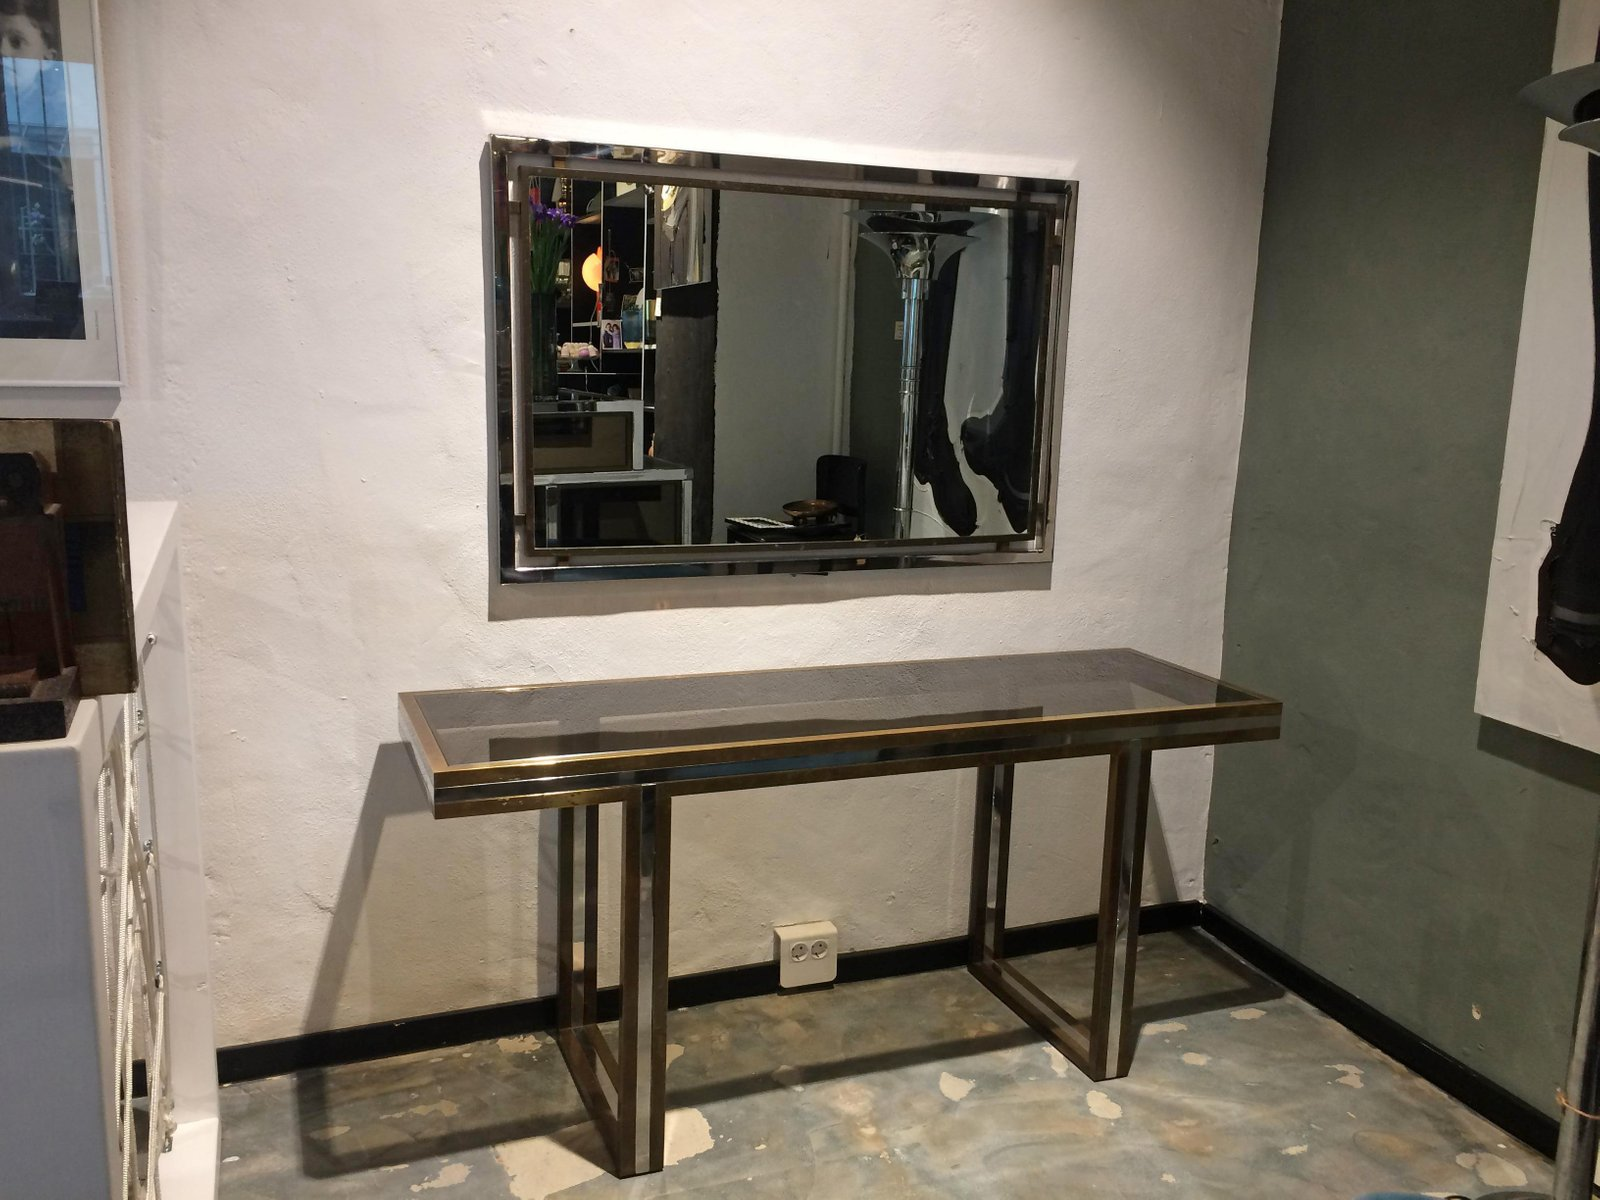 Console Table U0026 Mirror Set By Romeo Rega, 1970s